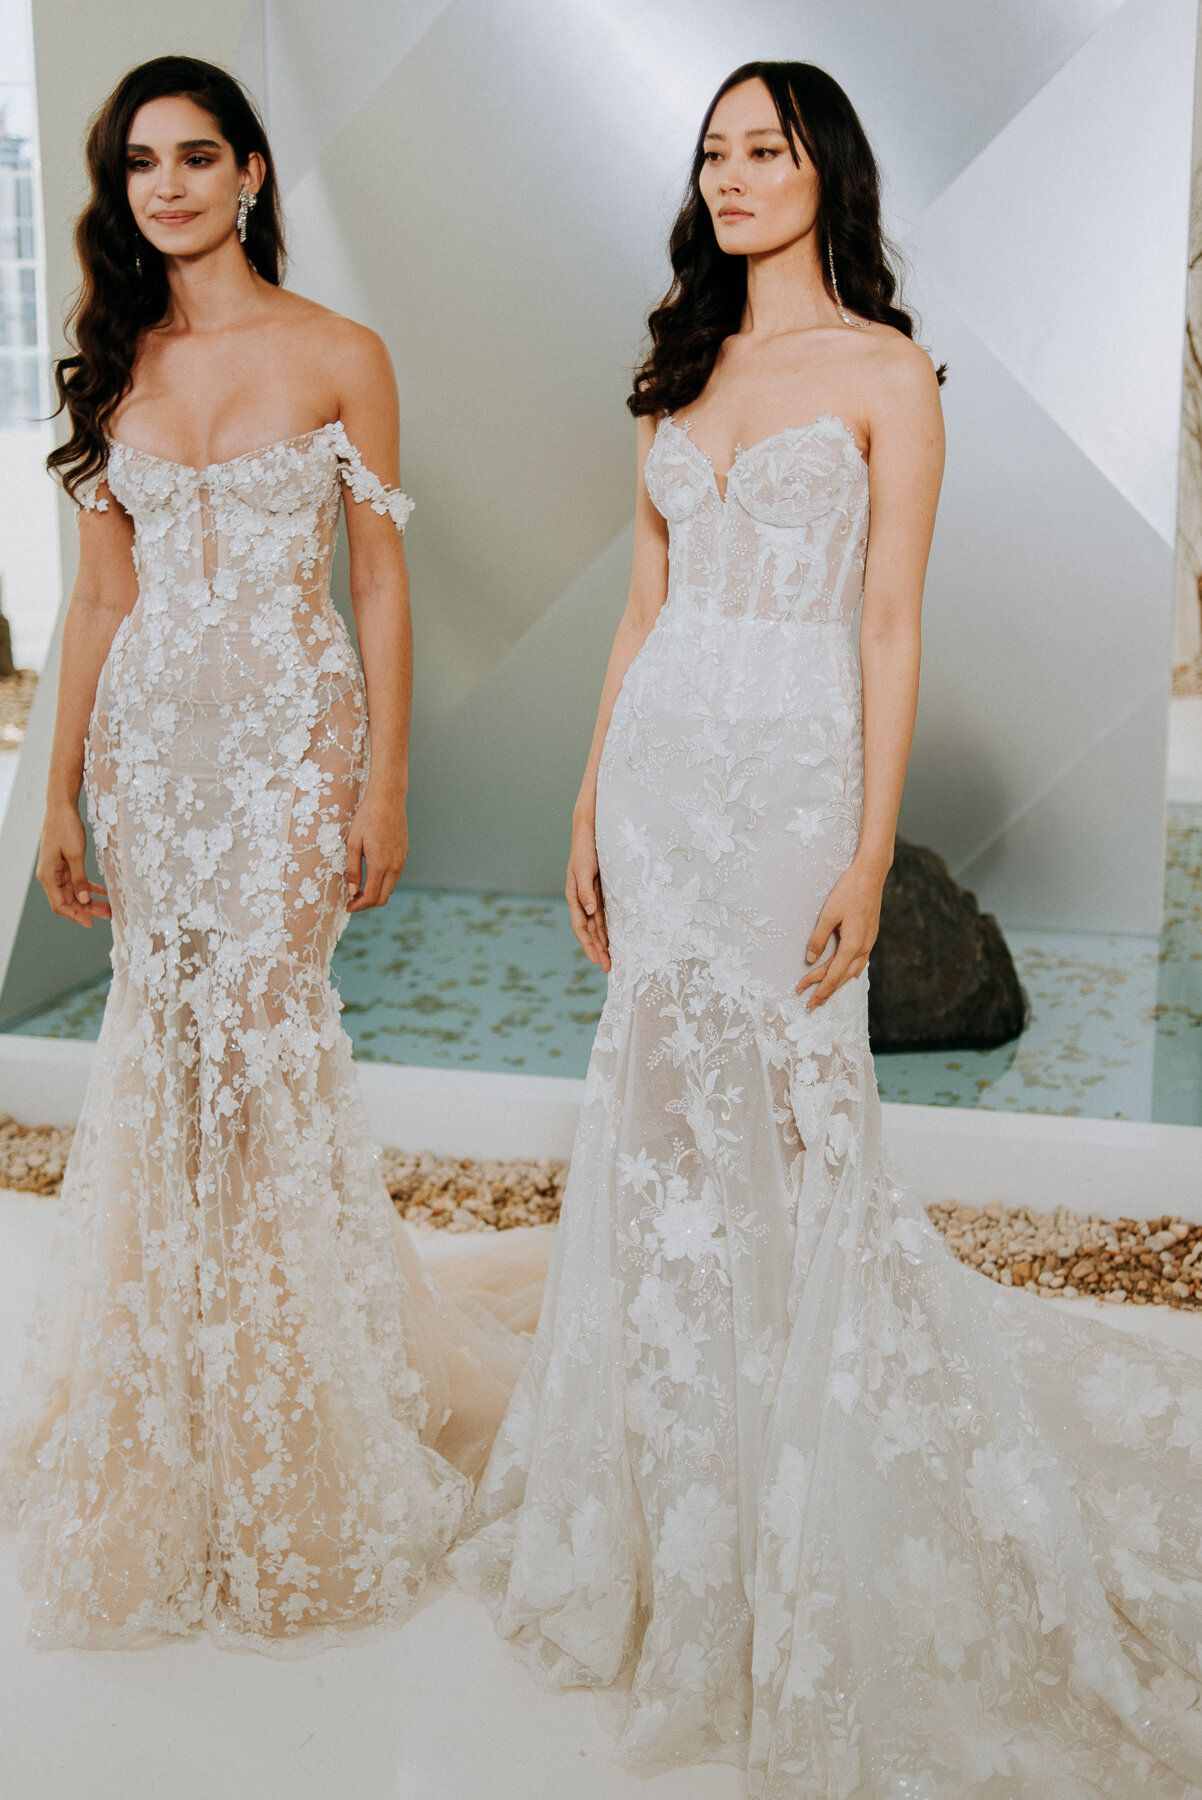 Galia Lahav Couture Gala Fall 2020 Collection Preview Little White Dress Bridal Shop Denver Colorado S Best Designer Wedding Dresses And Accessories Off White Wedding Dresses White Bridal Dresses Wedding Dresses